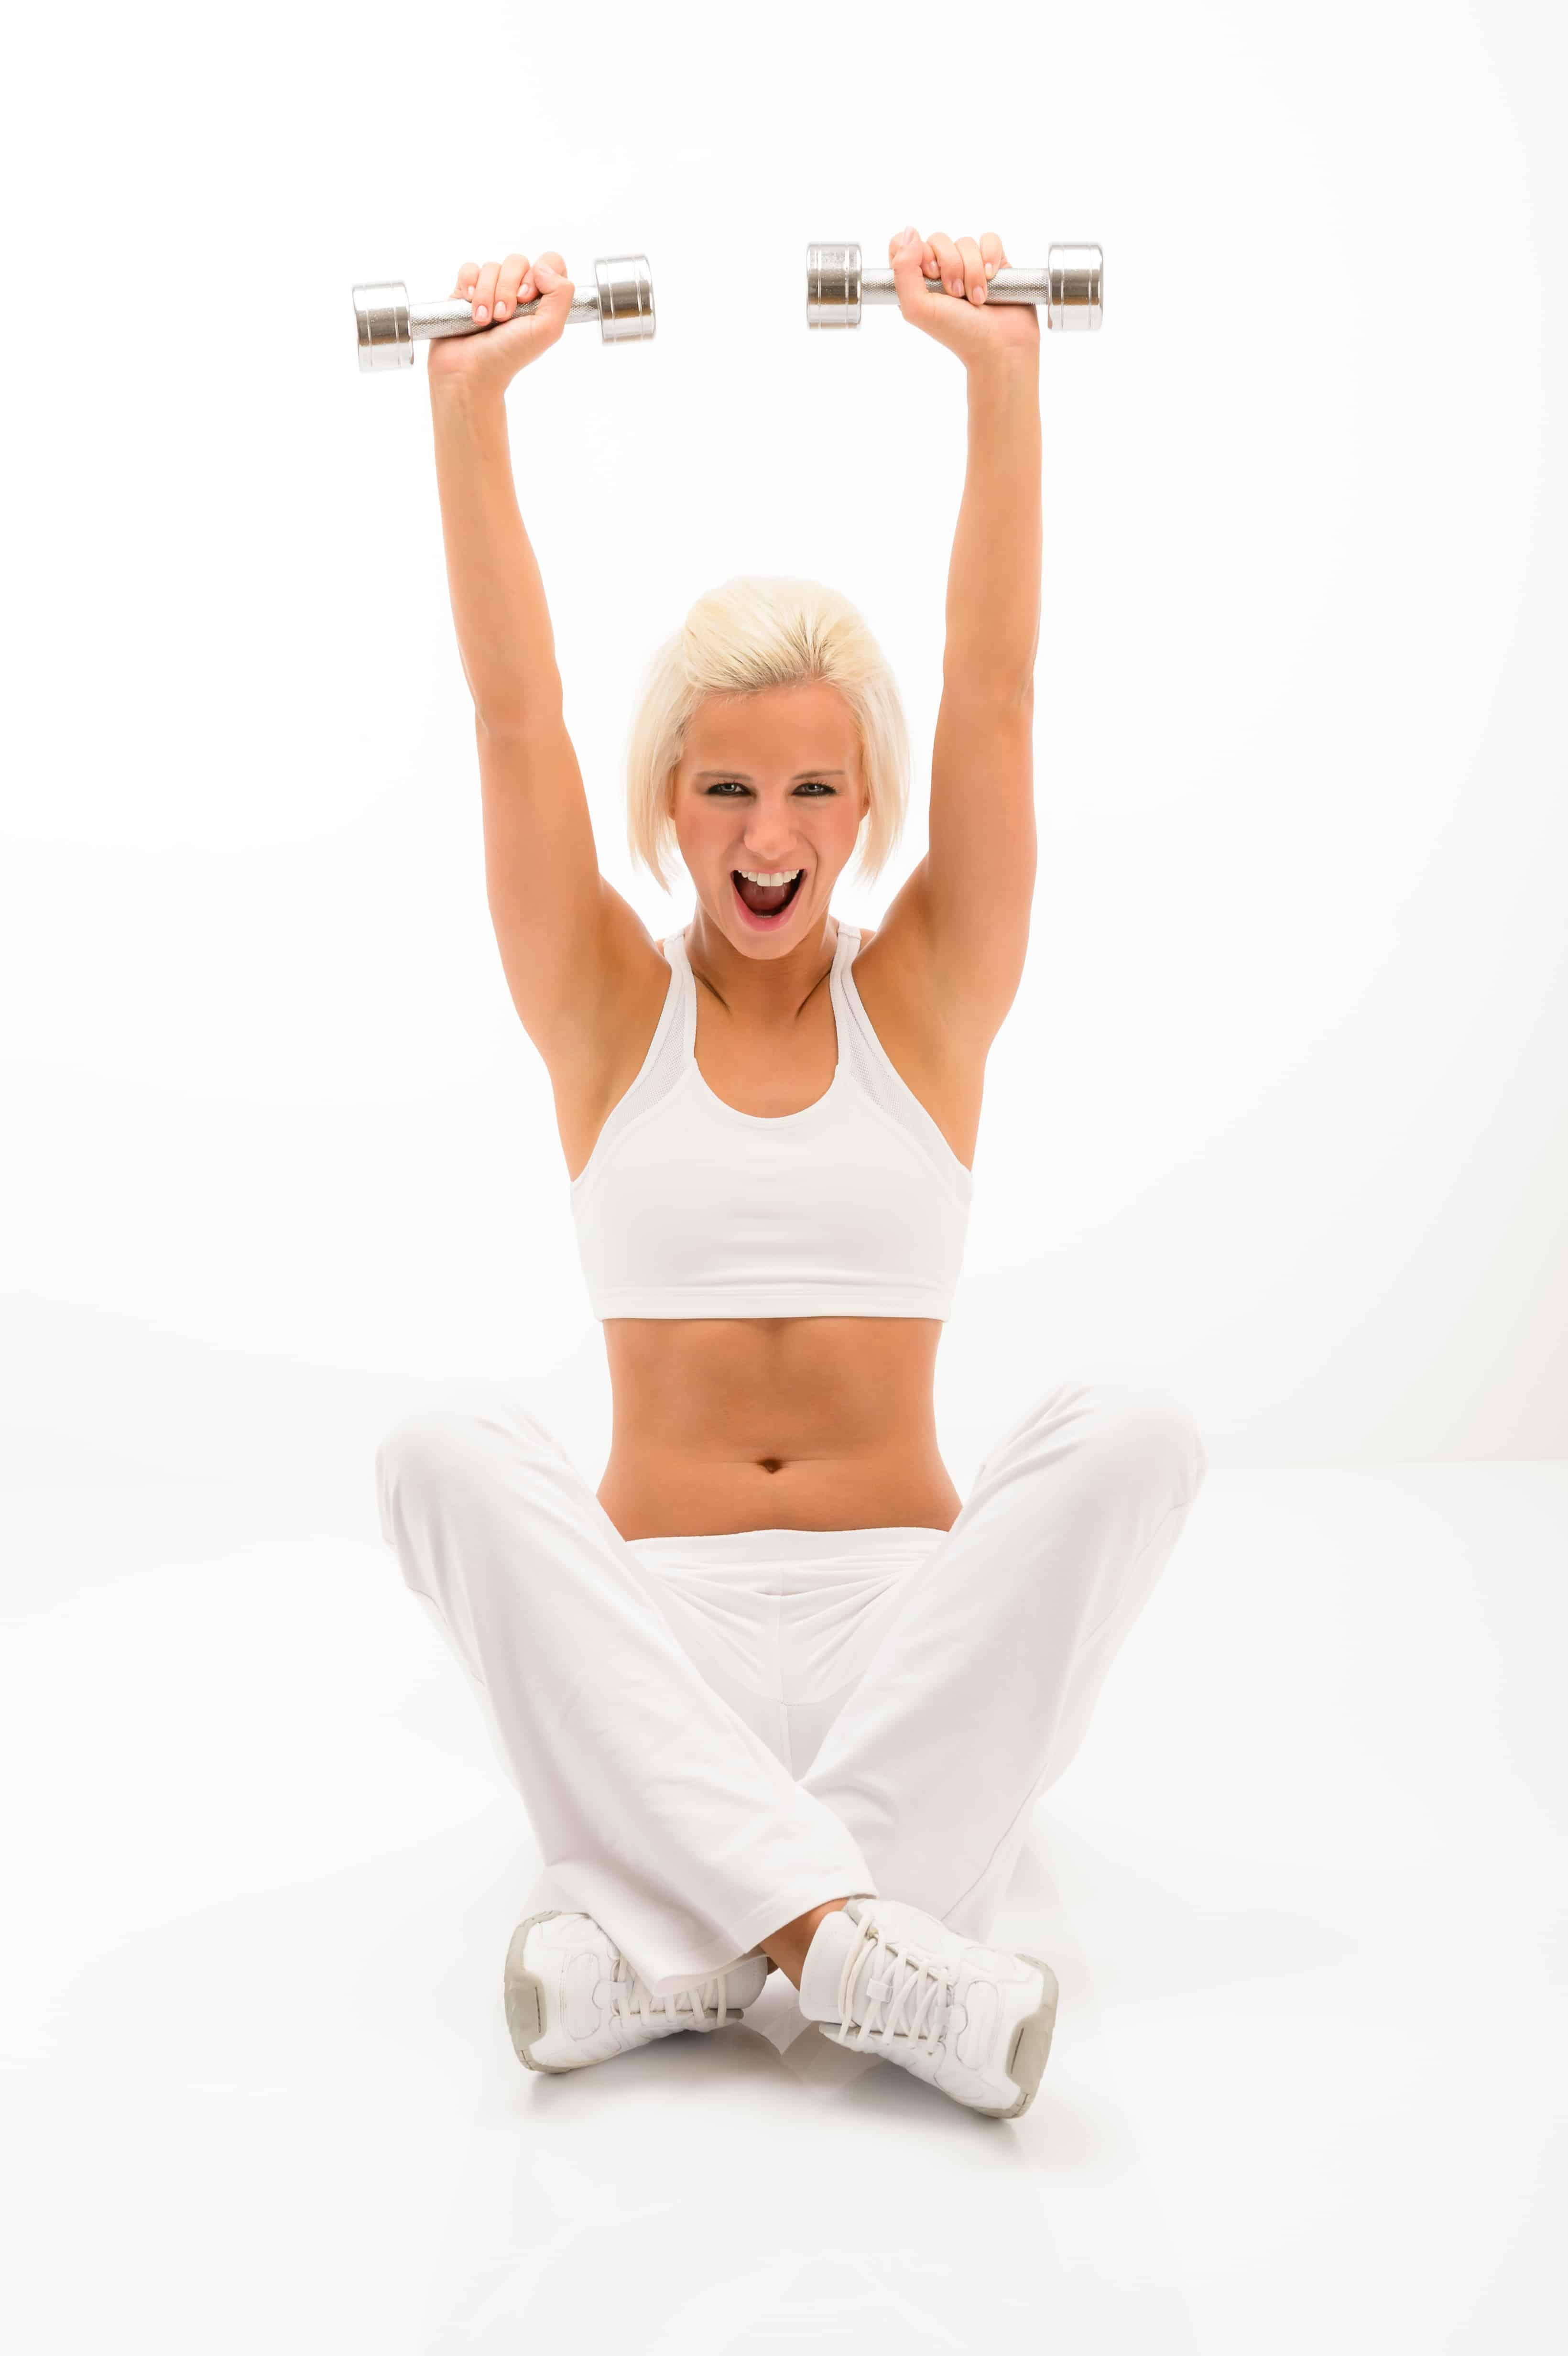 Fitness woman exercise in studio lifting dumbbells sitting white floor